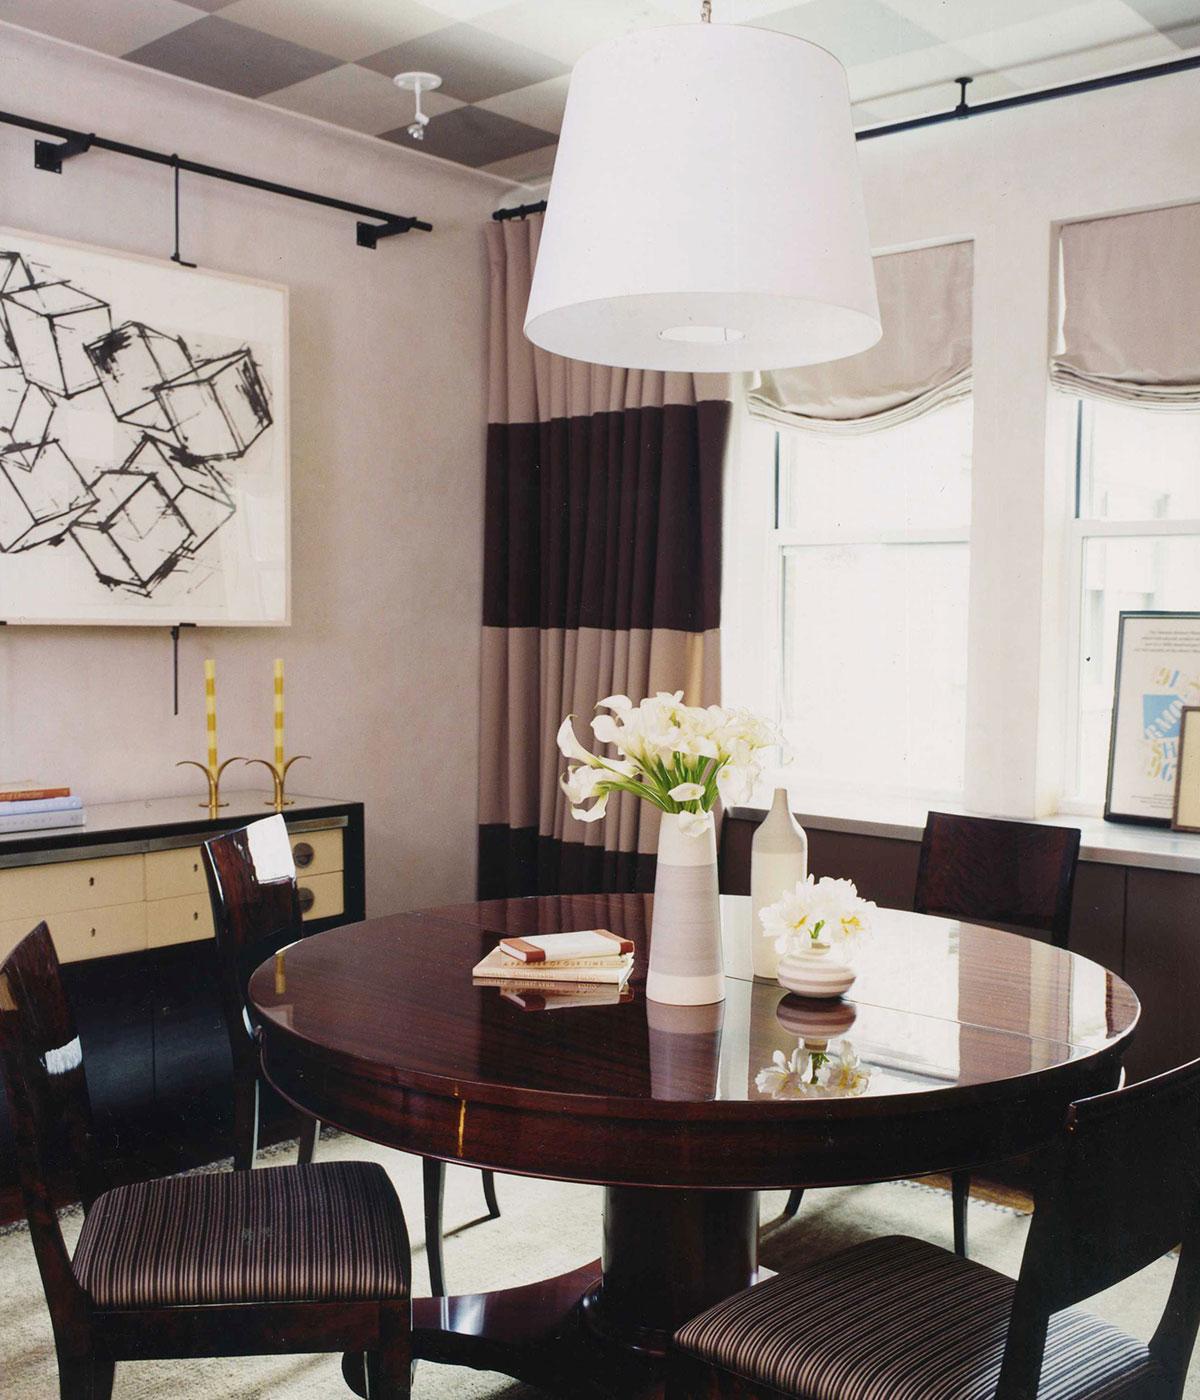 West 75th Street Apartment, New York